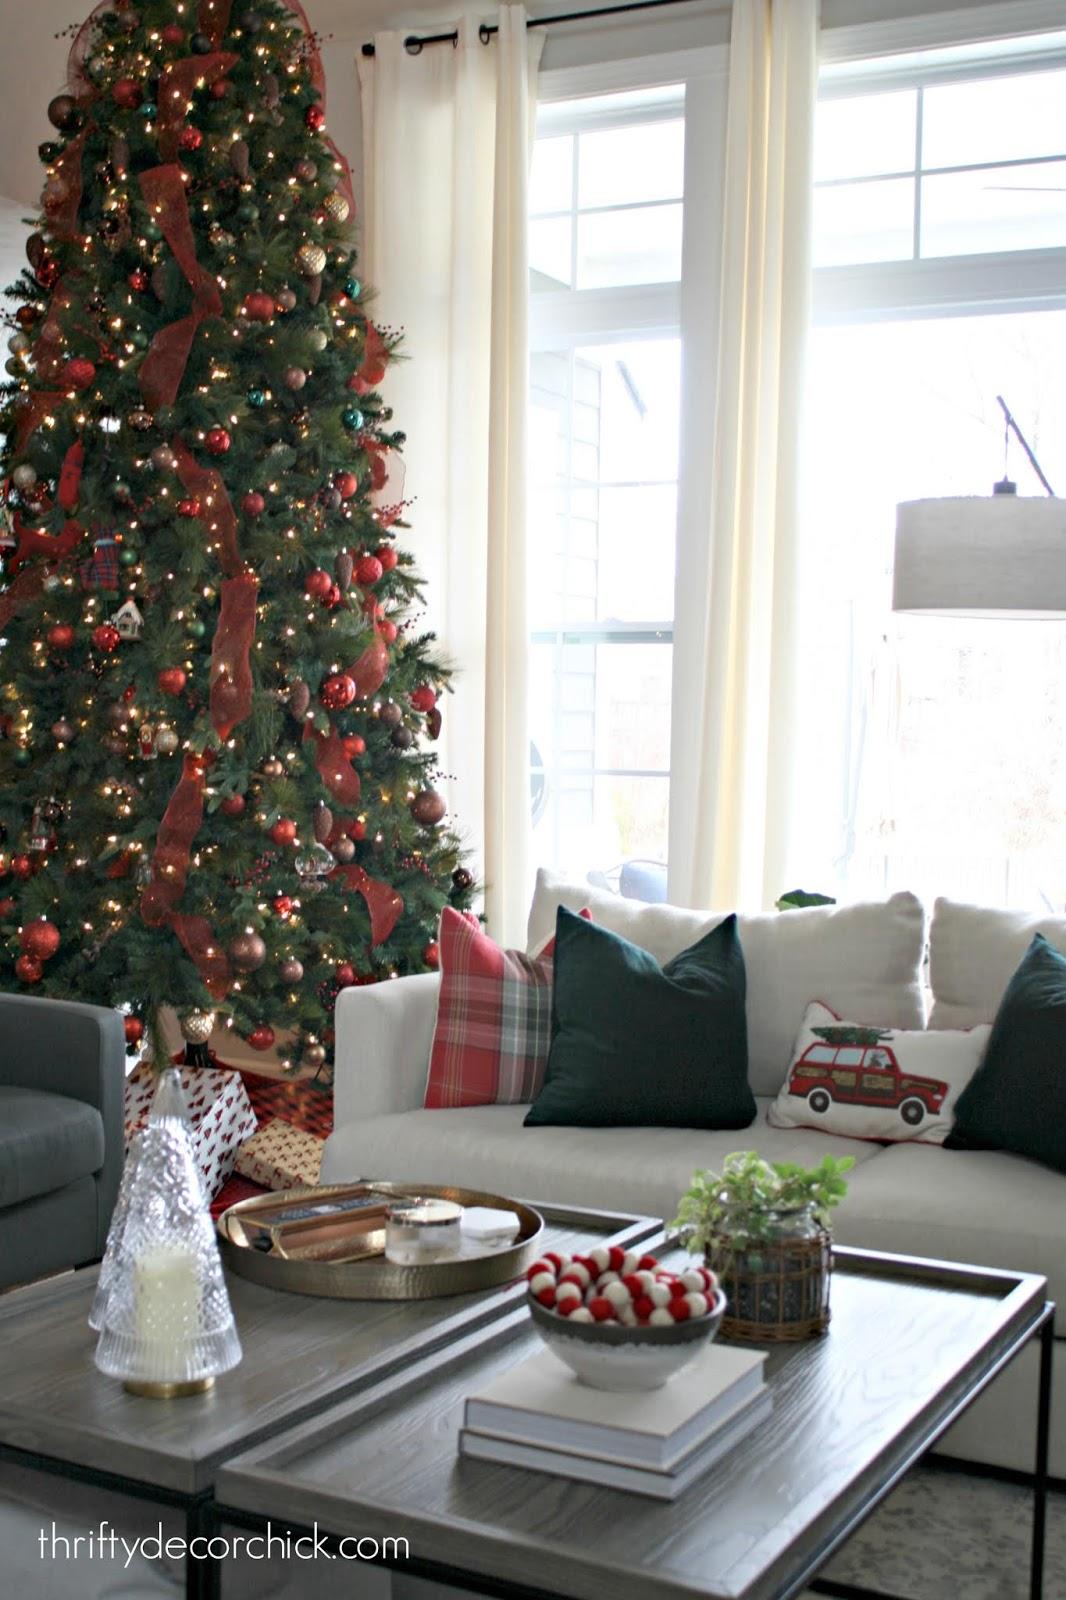 Decorating 12 foot Christmas tree